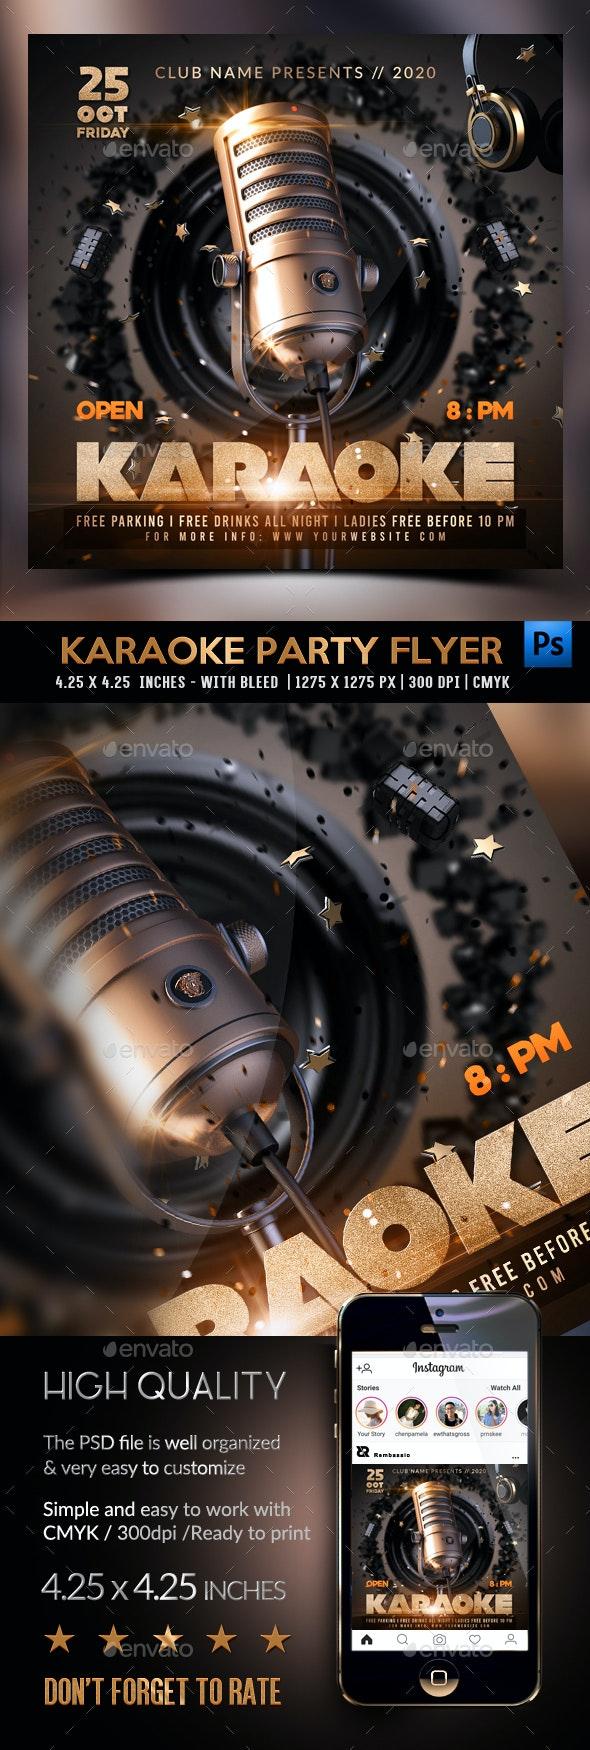 Karaoke Flyer Template - Clubs & Parties Events